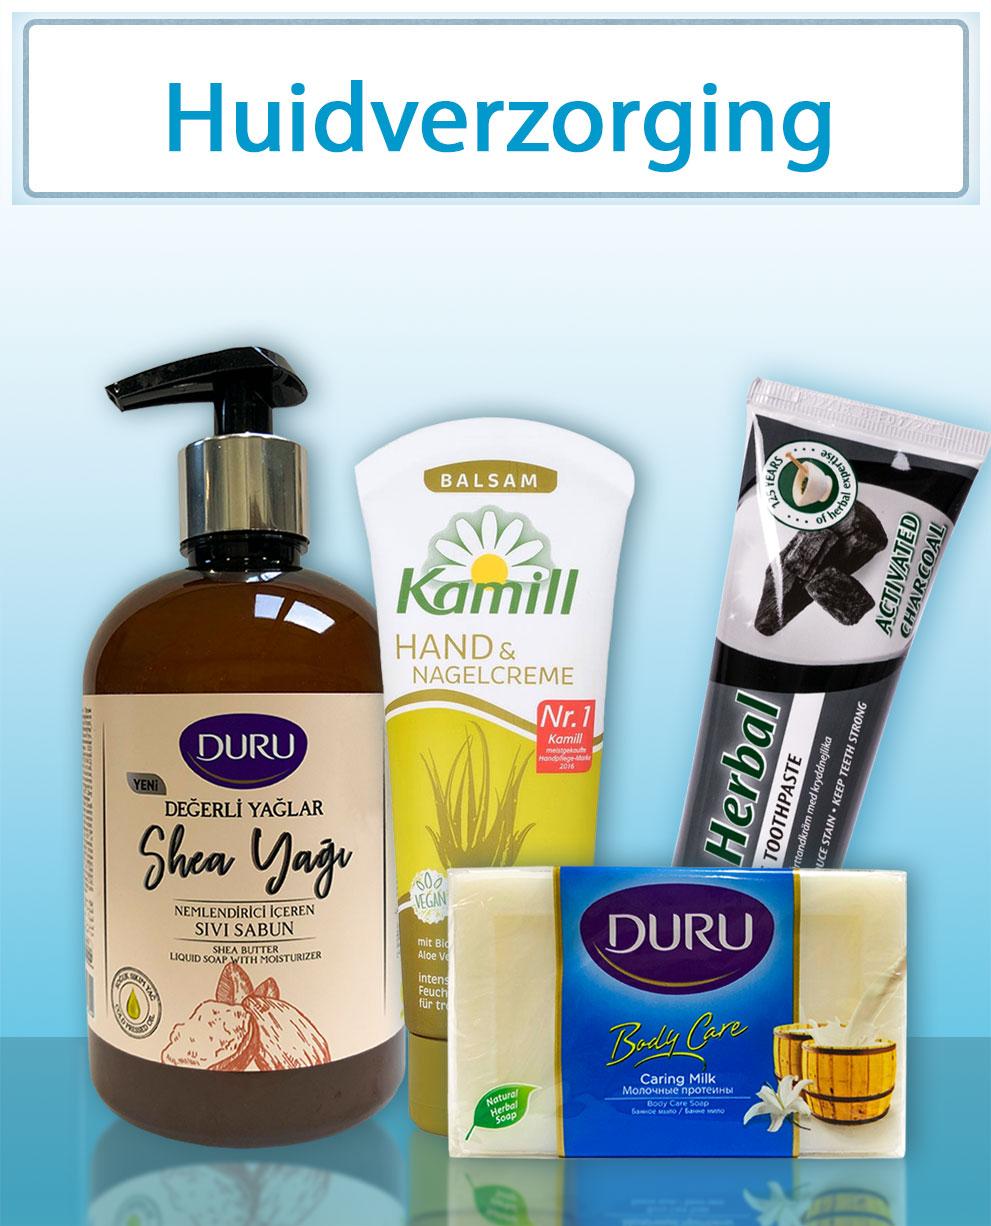 Categorie-06-Huidverzorging-bakingsoda-nl